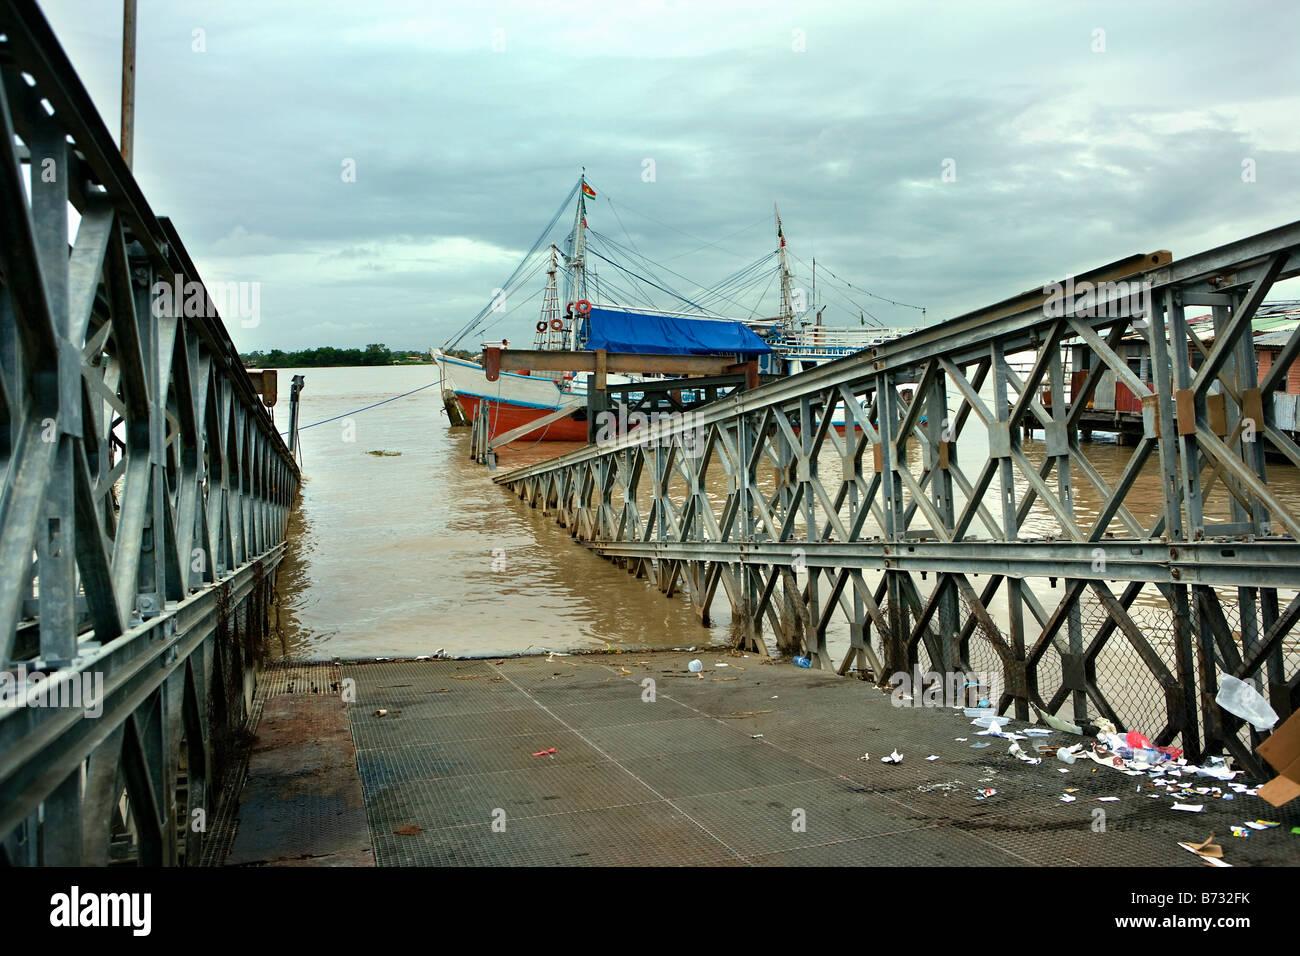 Suriname, Paramaribo. Neglected jetty. - Stock Image